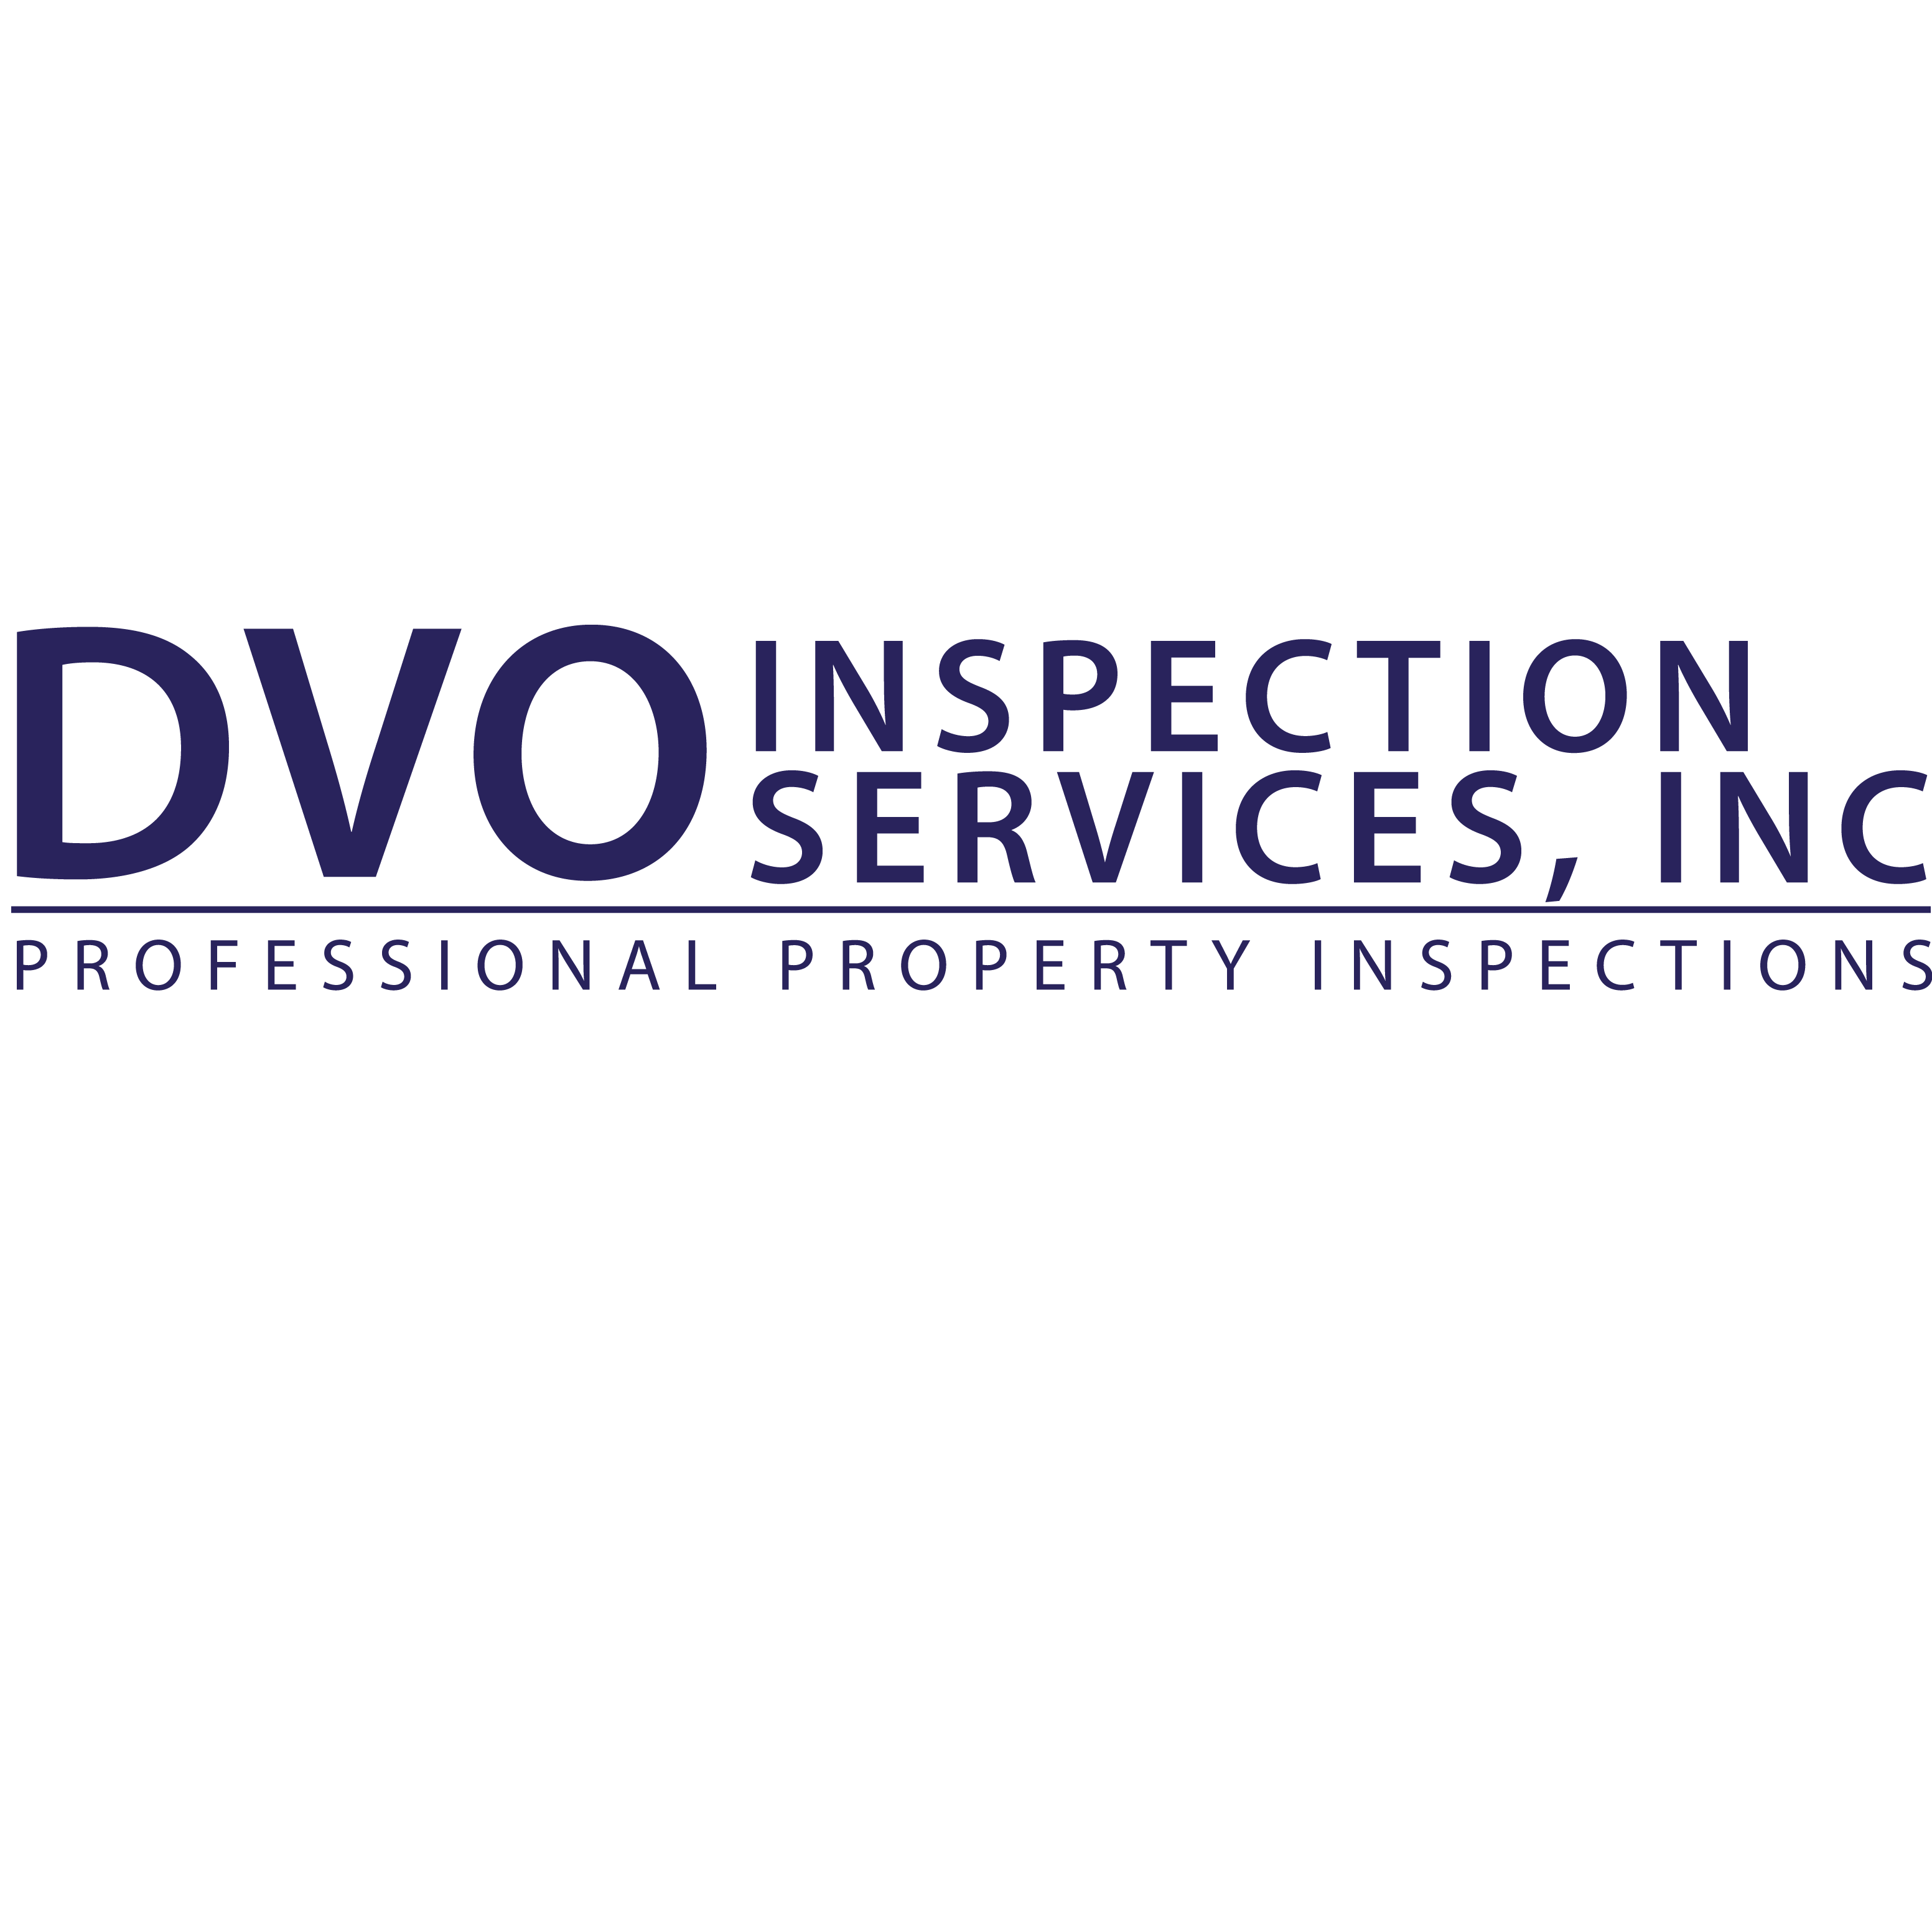 DVO Inspection Services, Inc